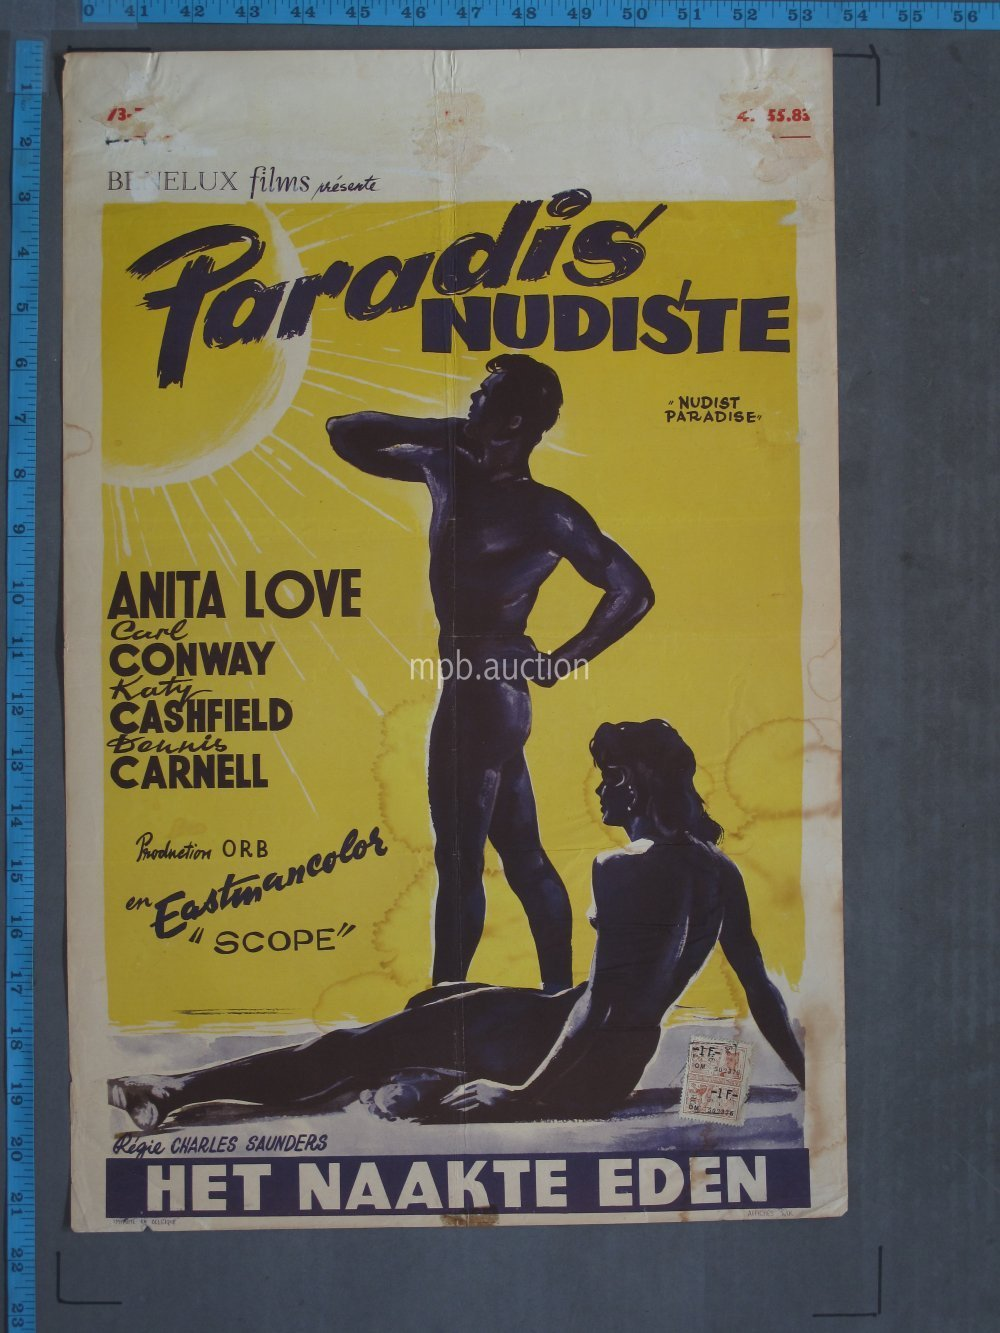 Filme - Natures Paradise - 1959